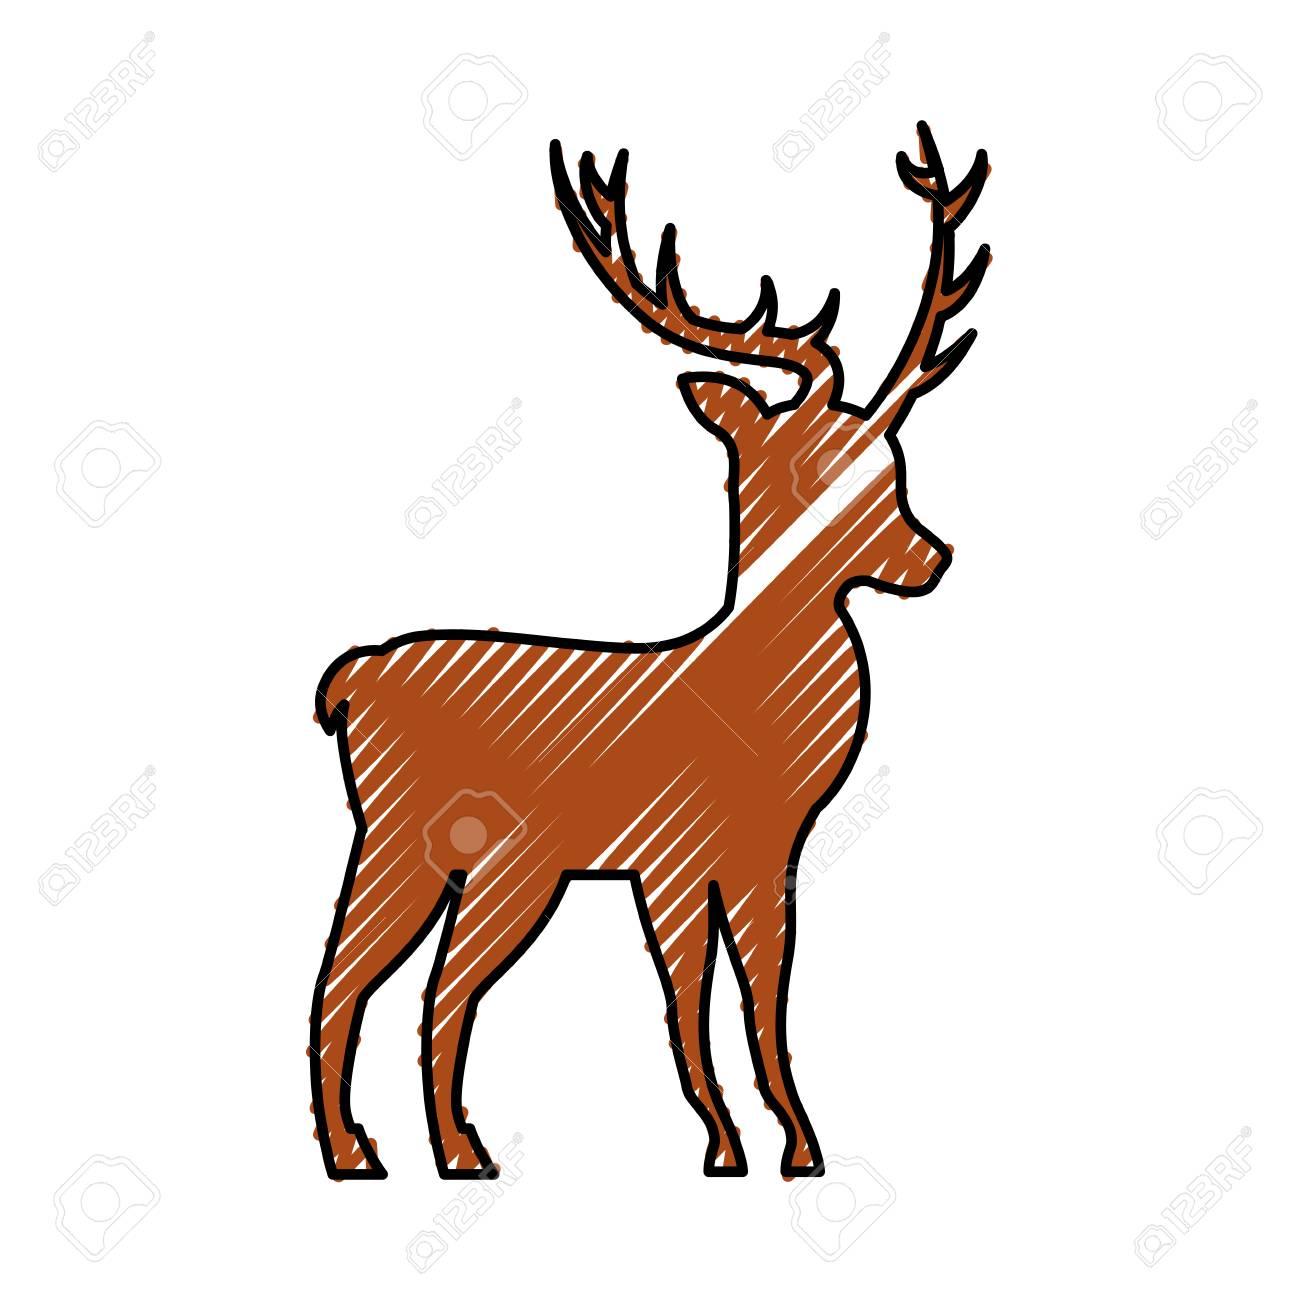 Christmas Reindeer Head Horned Animal Decoration Vector Illustration Stock